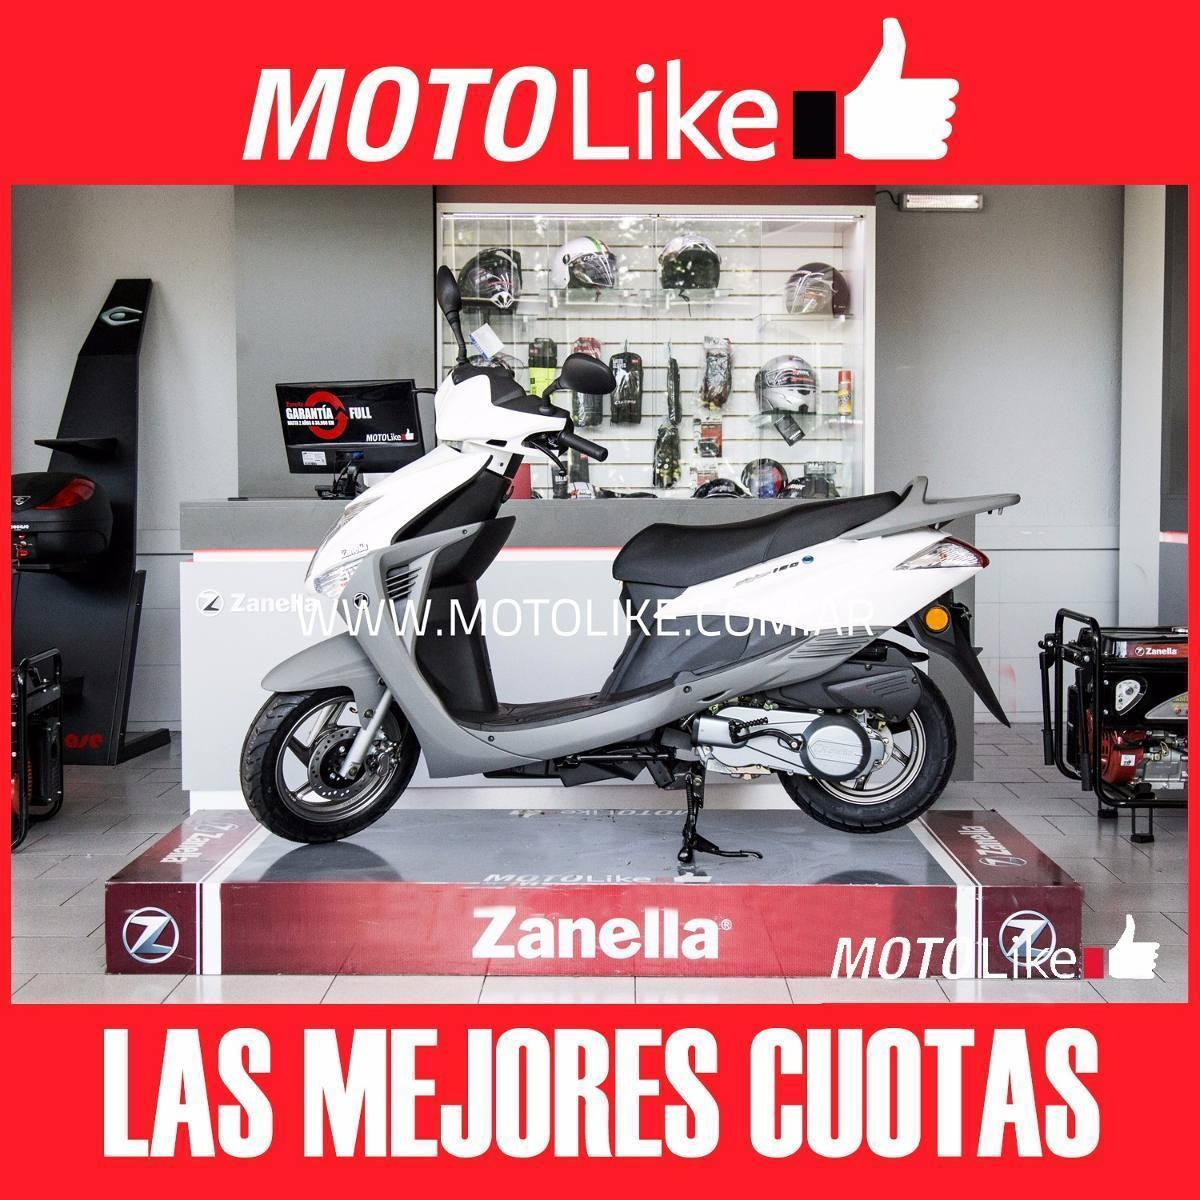 Zanella Styler Lt 150 Nuevo Modelo 2017 Moto Like 0km